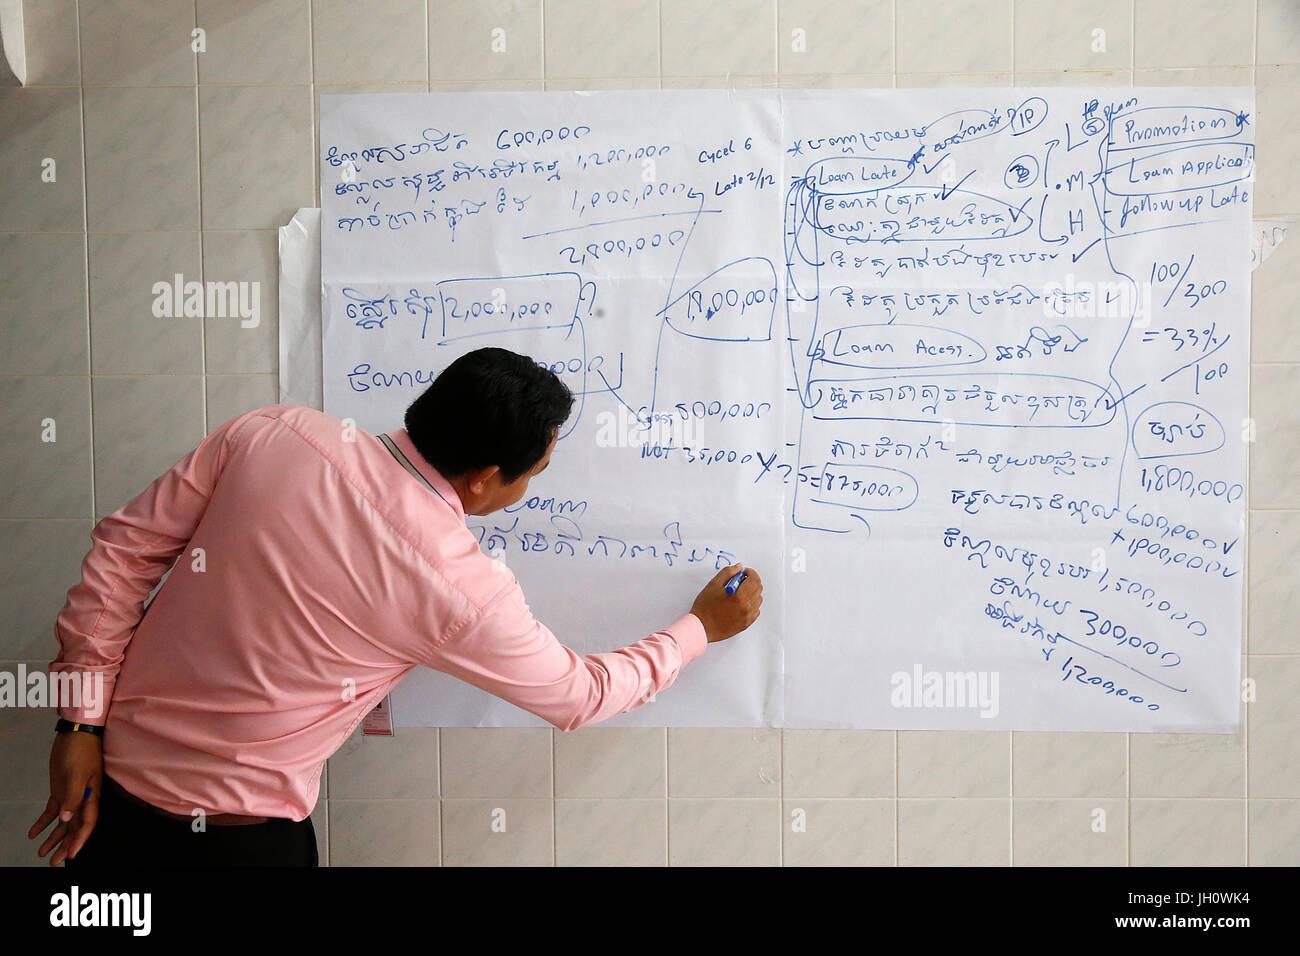 Chamroeun Microfinance Battambang Niederlassung. Kambodscha. Stockbild